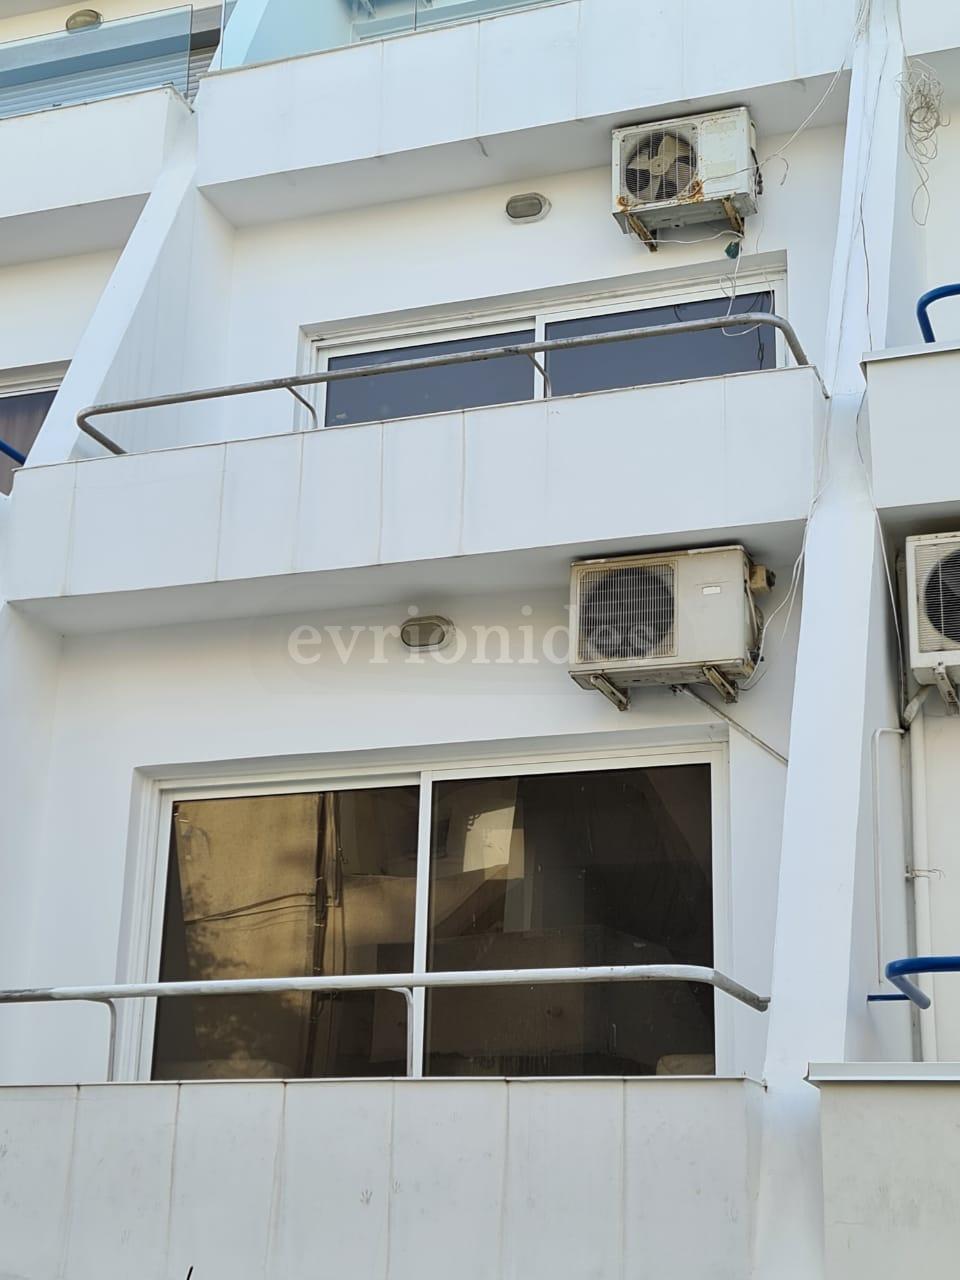 One bedroom duplex apartment in Agios Tychonas